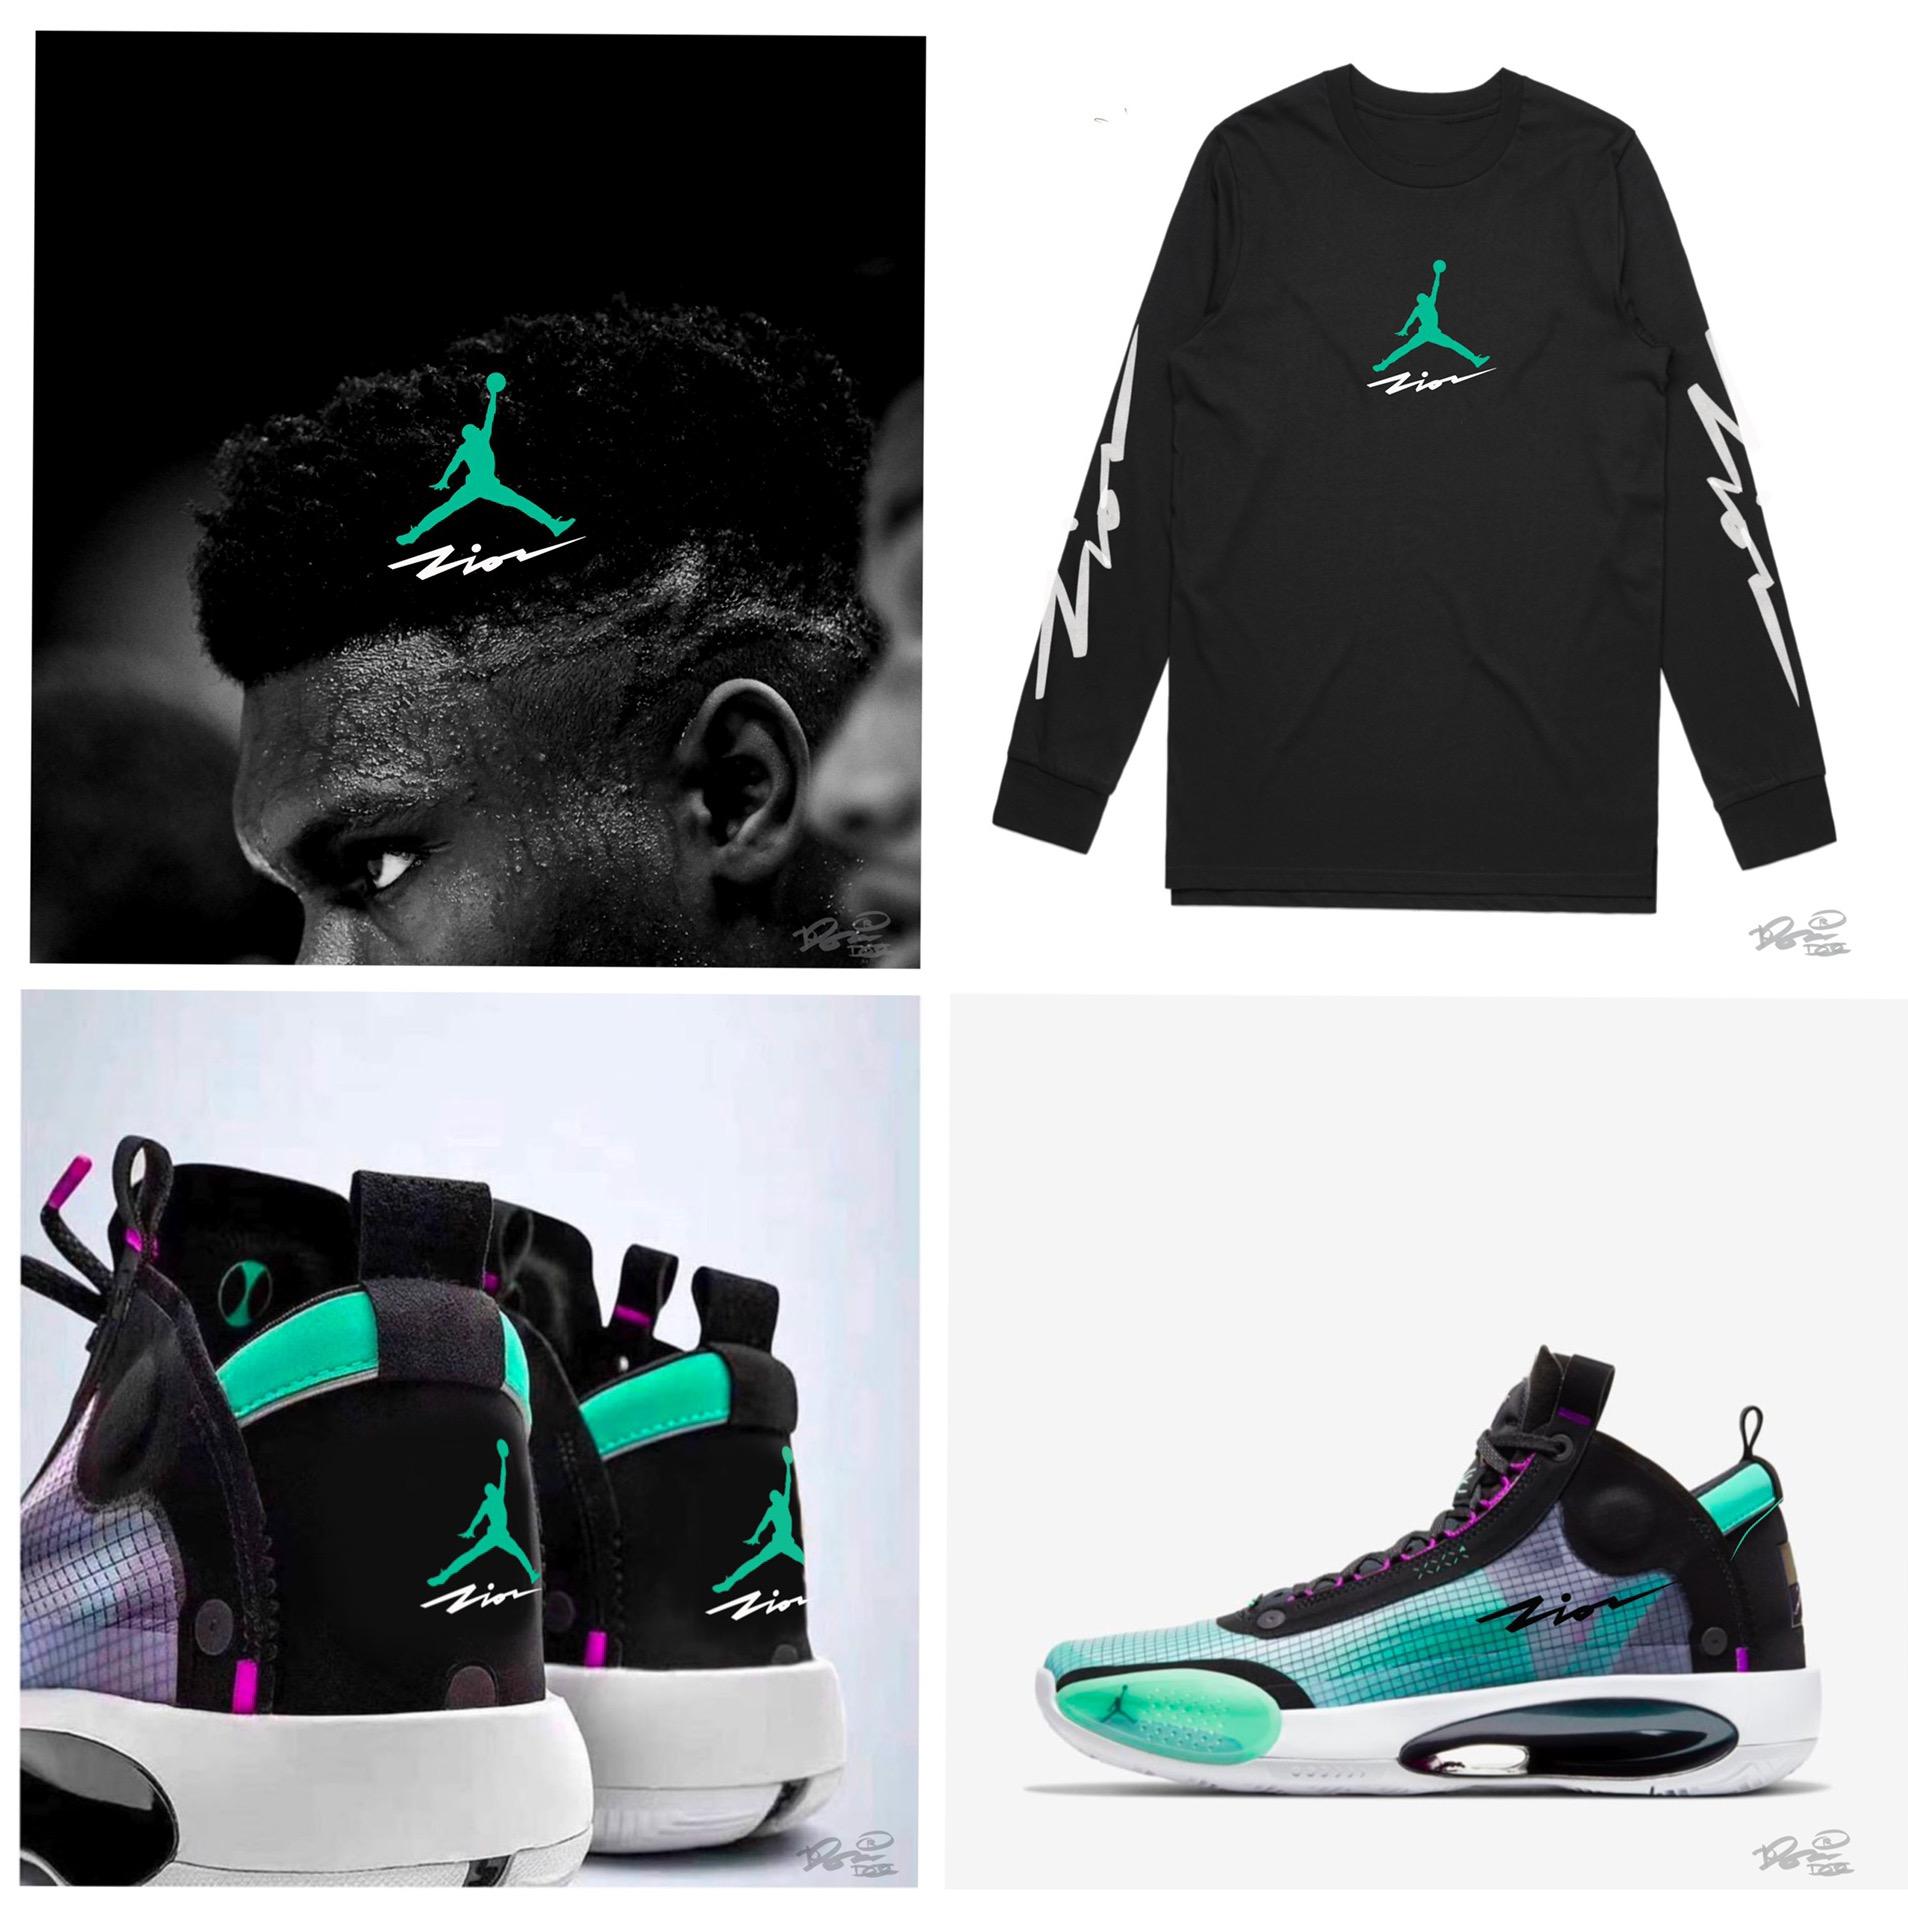 Zion Williamson Jordan Brand Shoe